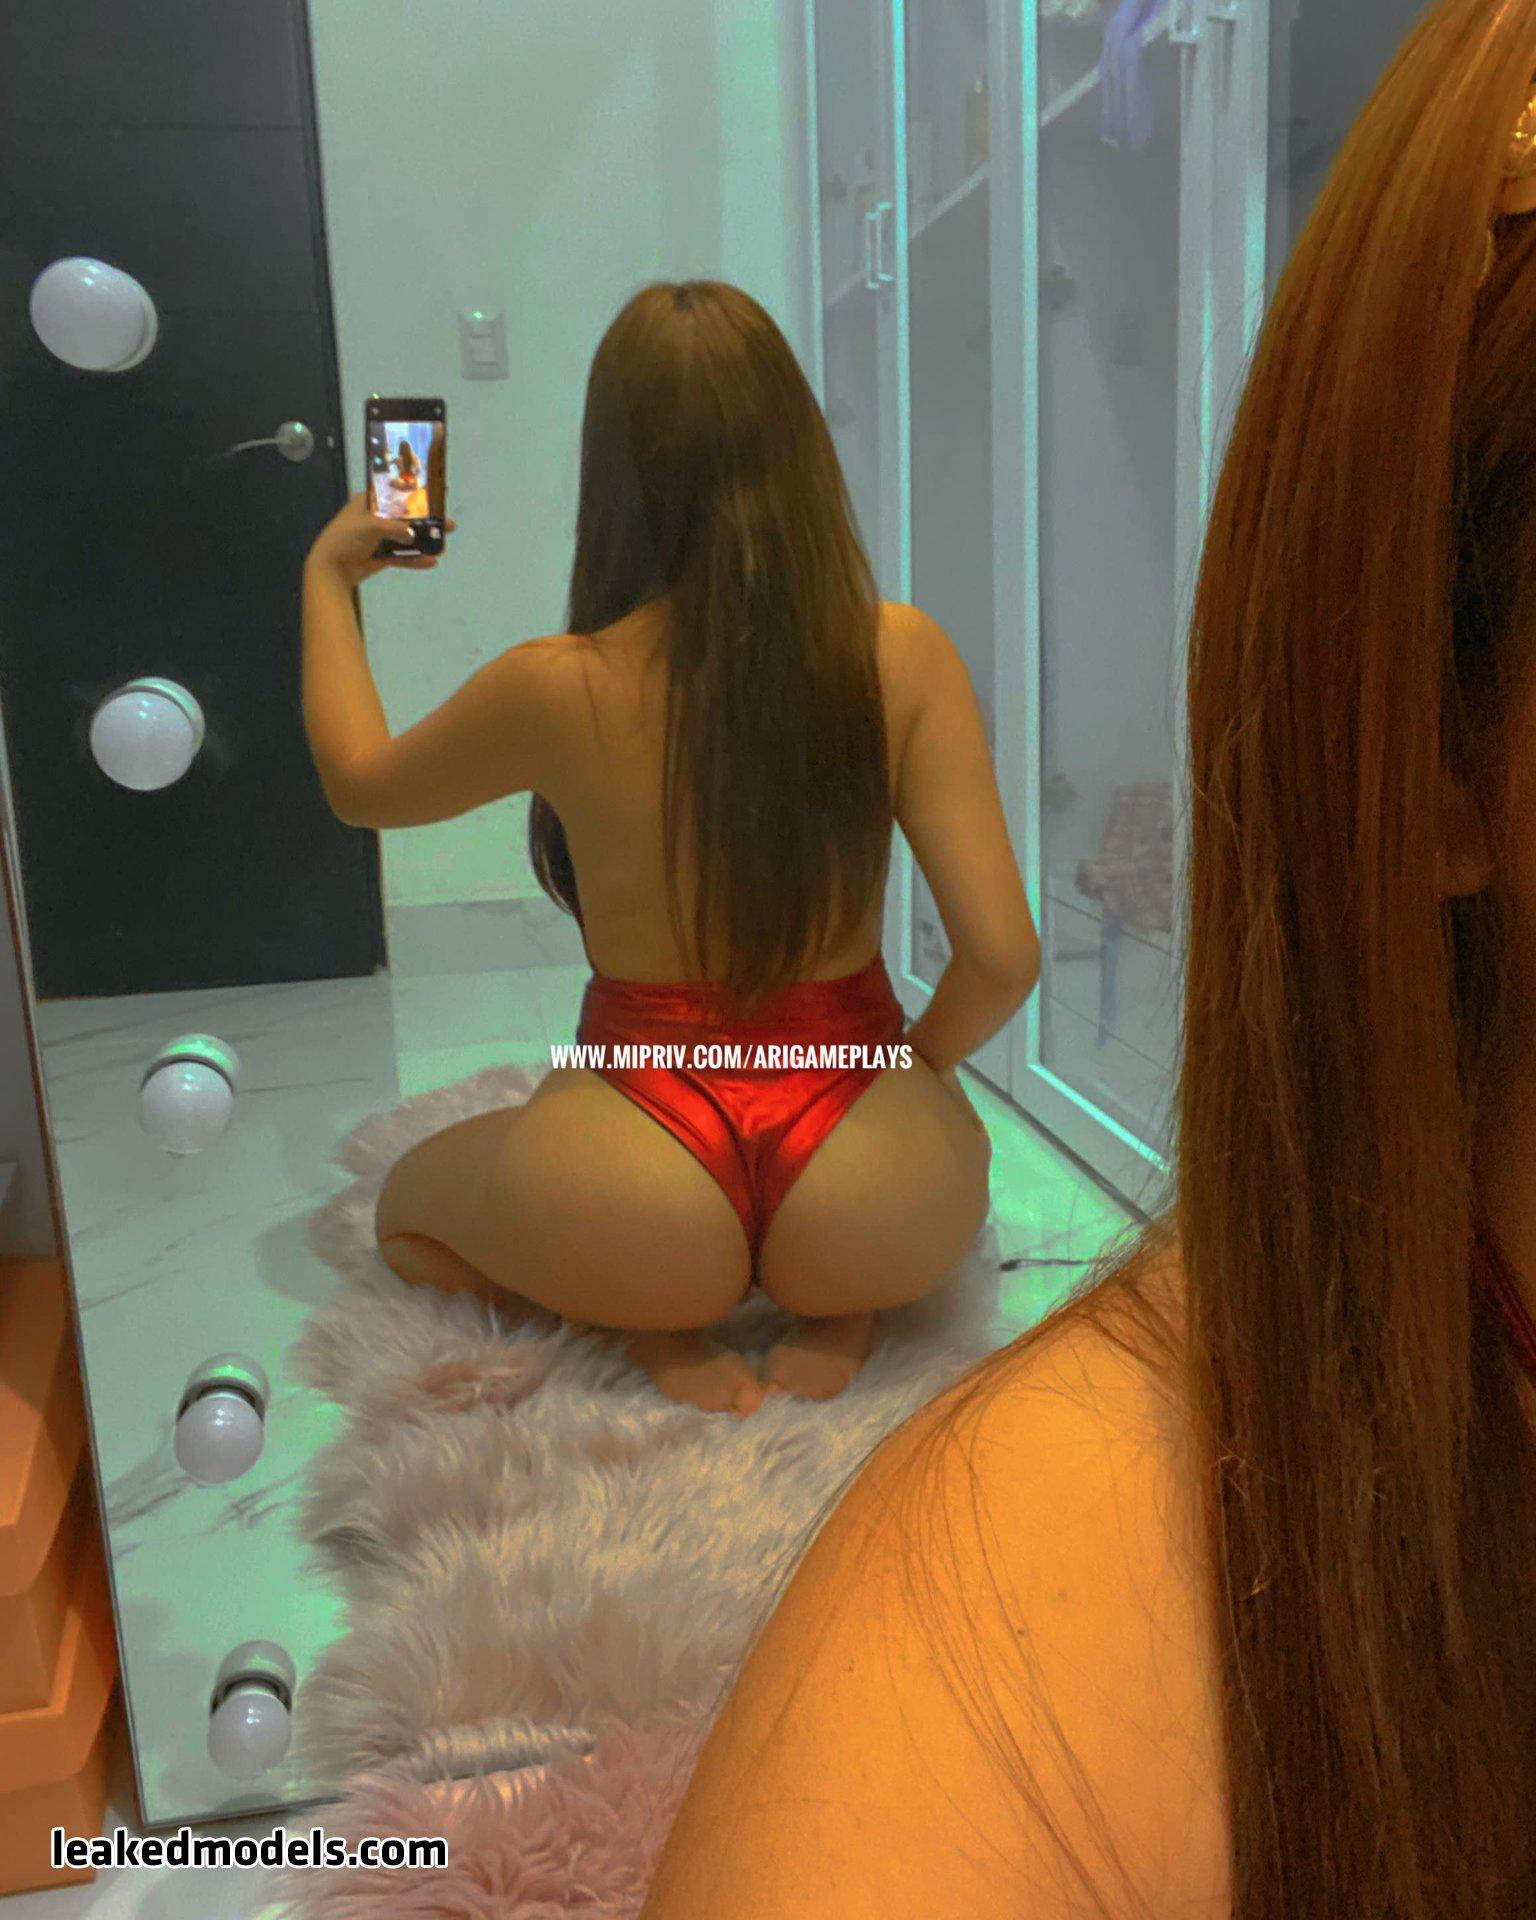 AriGameplays Instagram Nude Leaks (47 Photos)